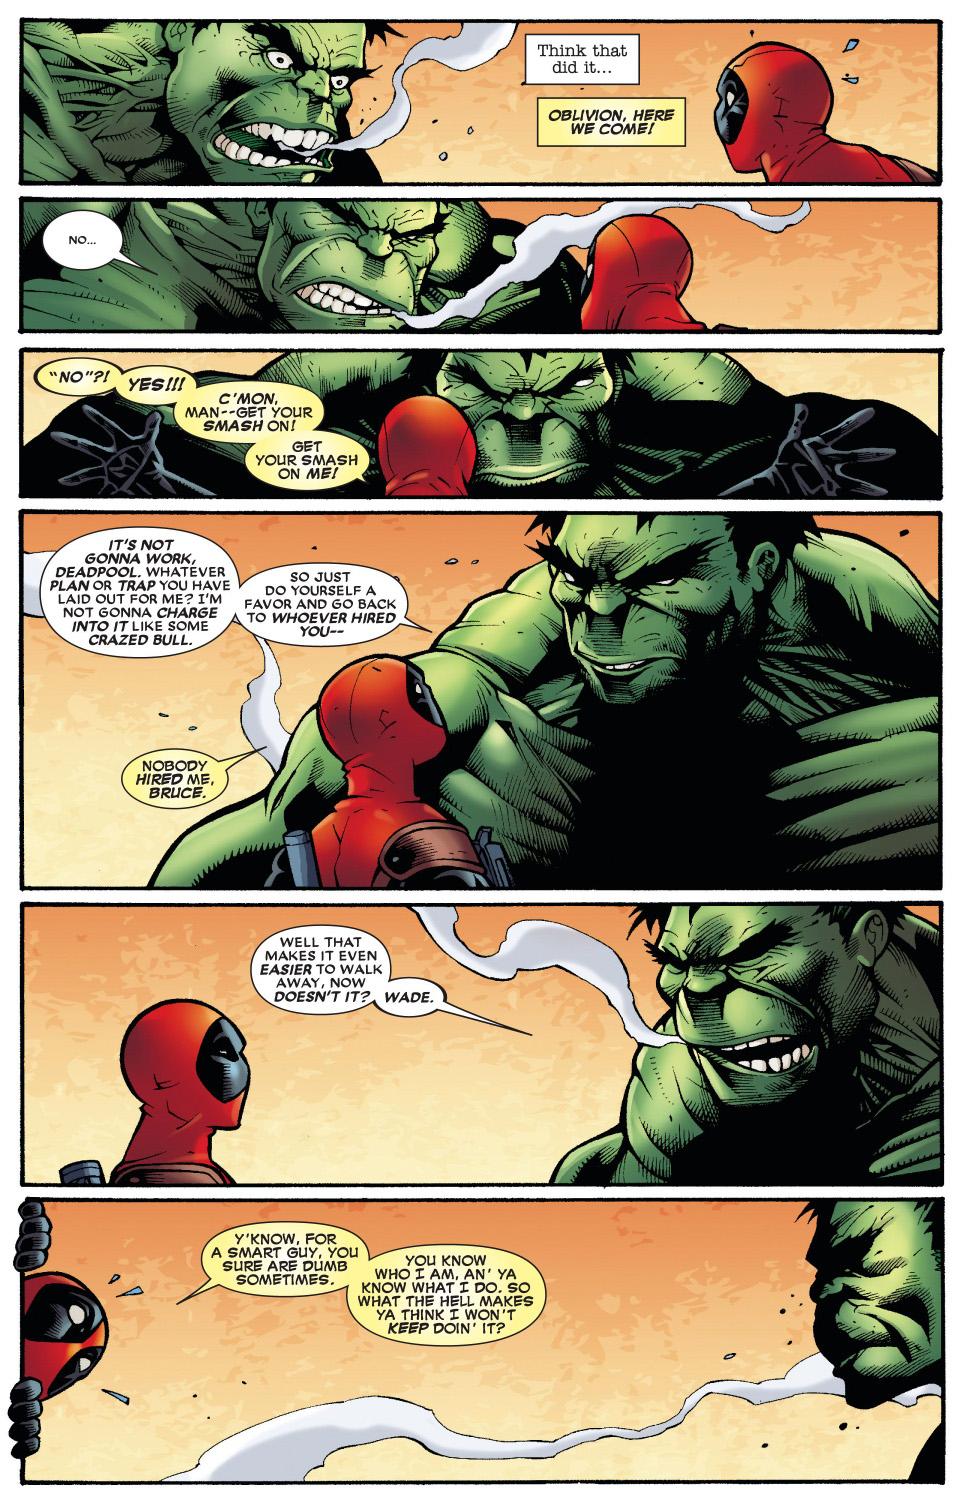 deadpool vs the hulk 3